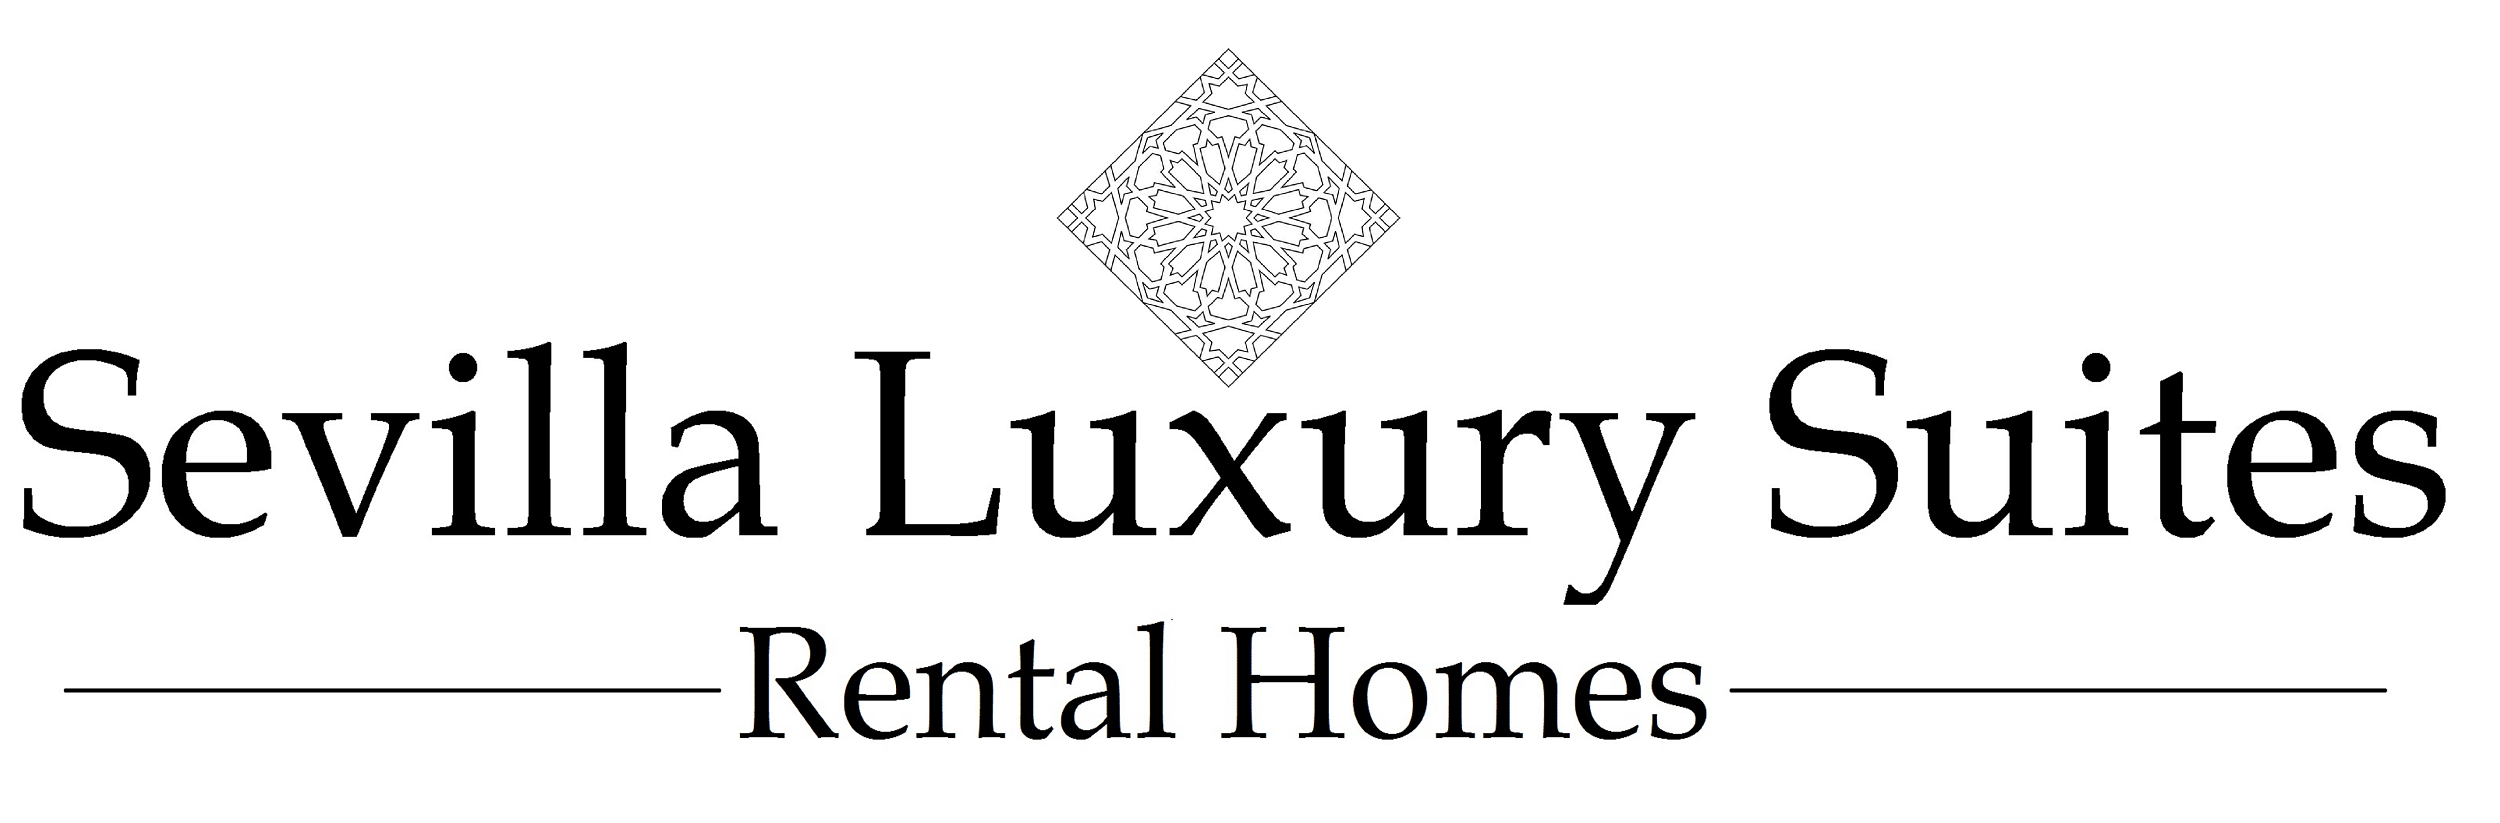 Sevilla Luxury Suites